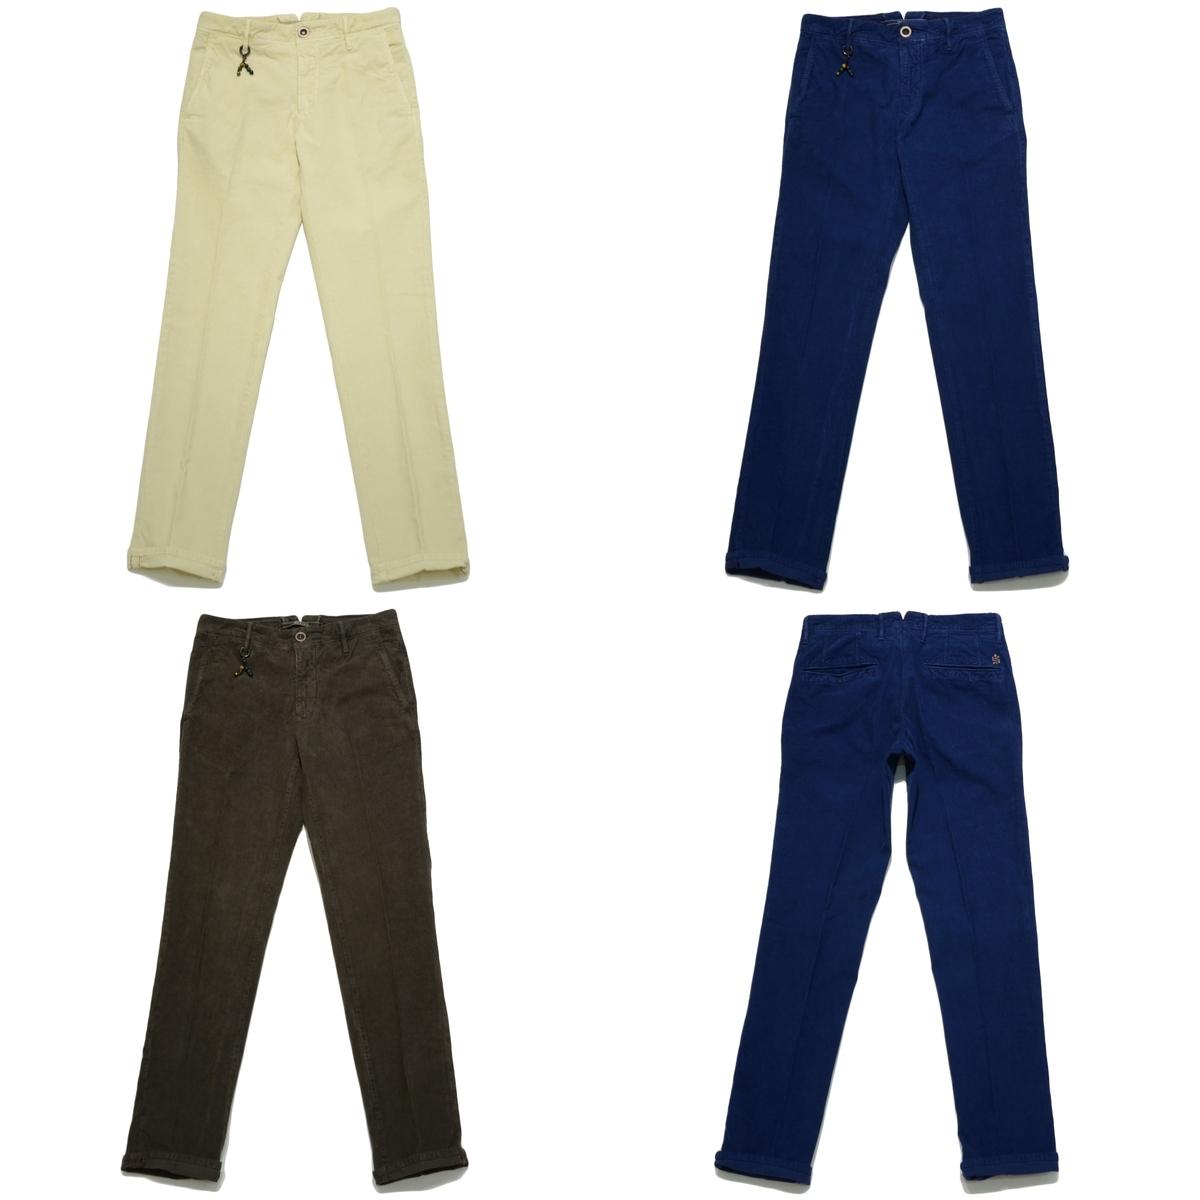 INCOTEX SLACKS 1ST603成衣染色伸胡扯条绒圓錐裤子1ST603-4045813052004091